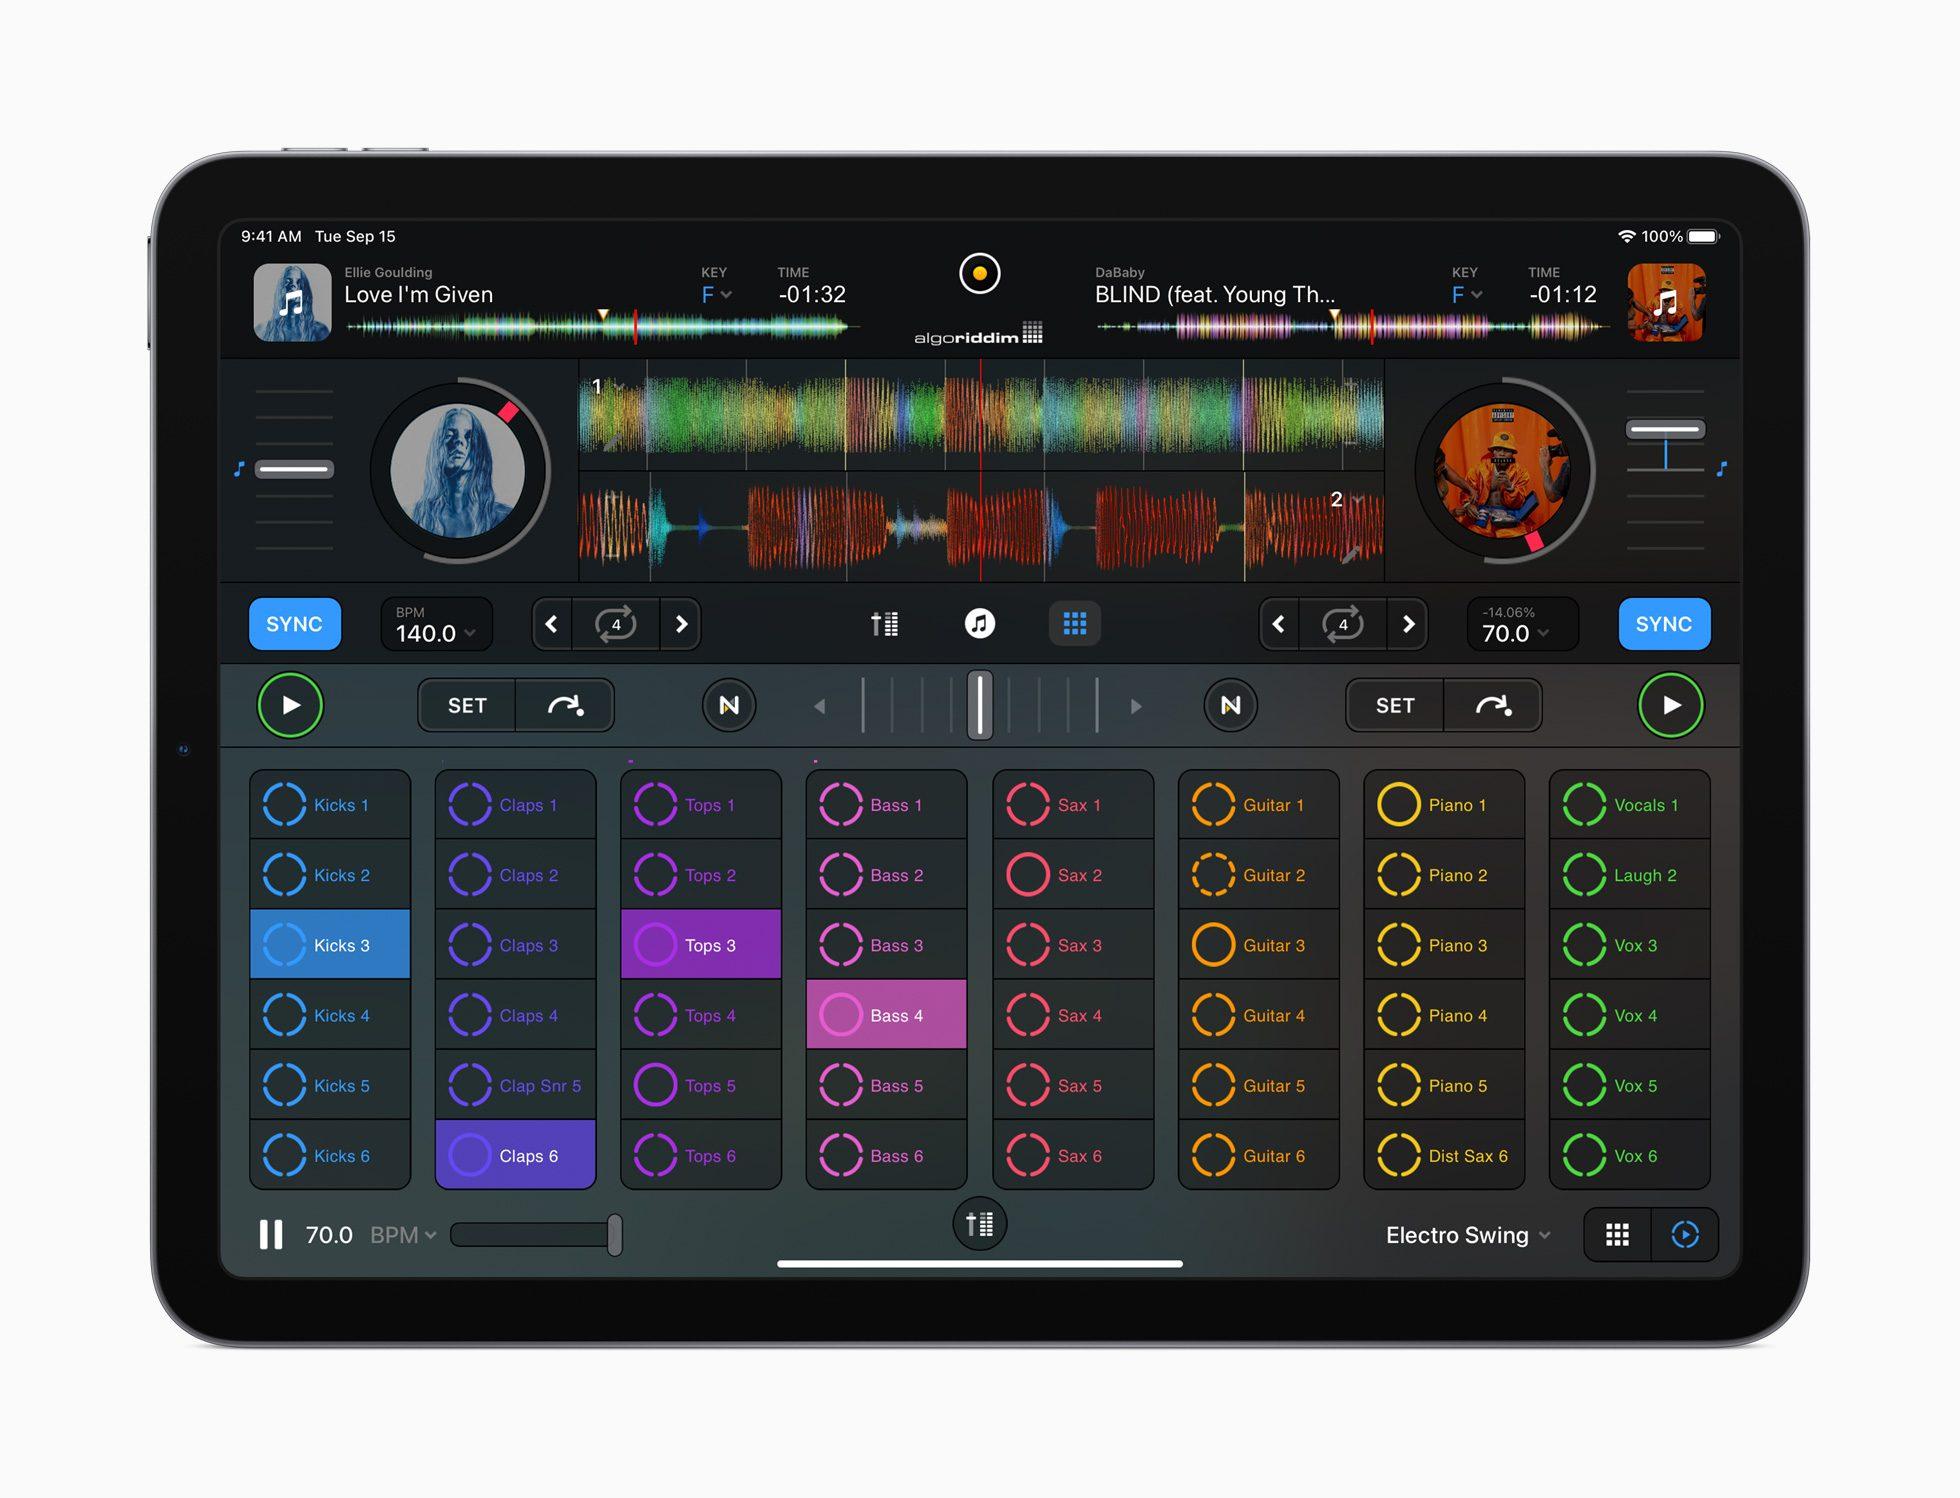 apple_new-ipad-air_a14-bionic-performance_09152020